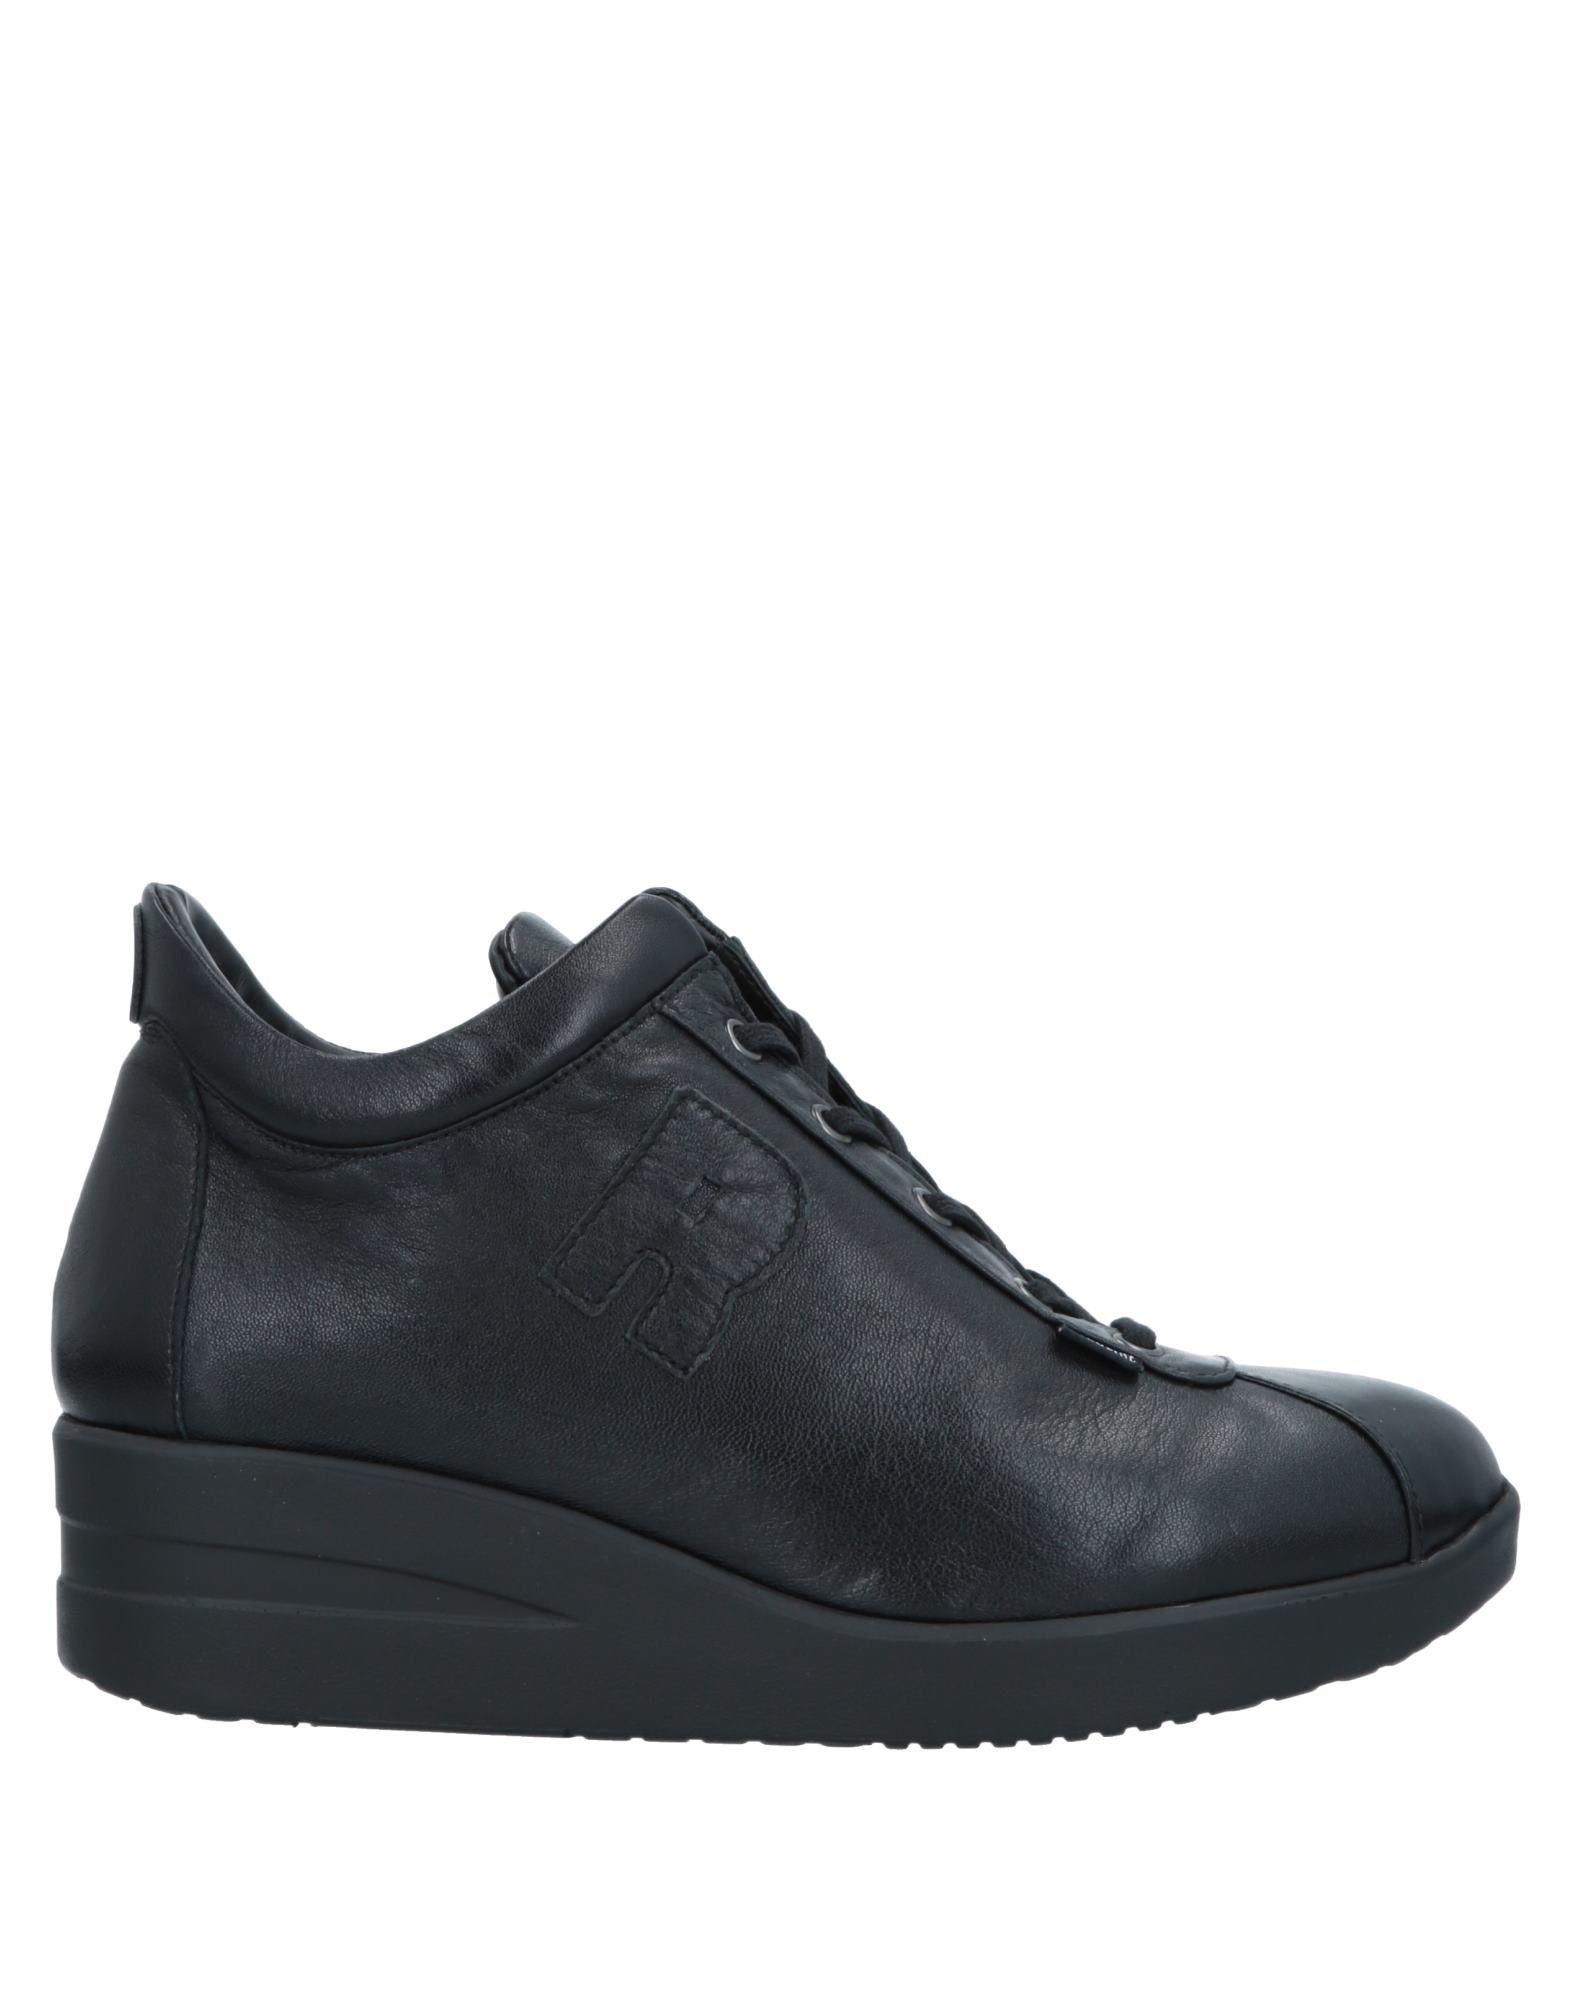 Negro Zapatillas Ruco Line Mujer Mujer Mujer - Zapatillas Ruco Line Moda barata y hermosa 167cf8